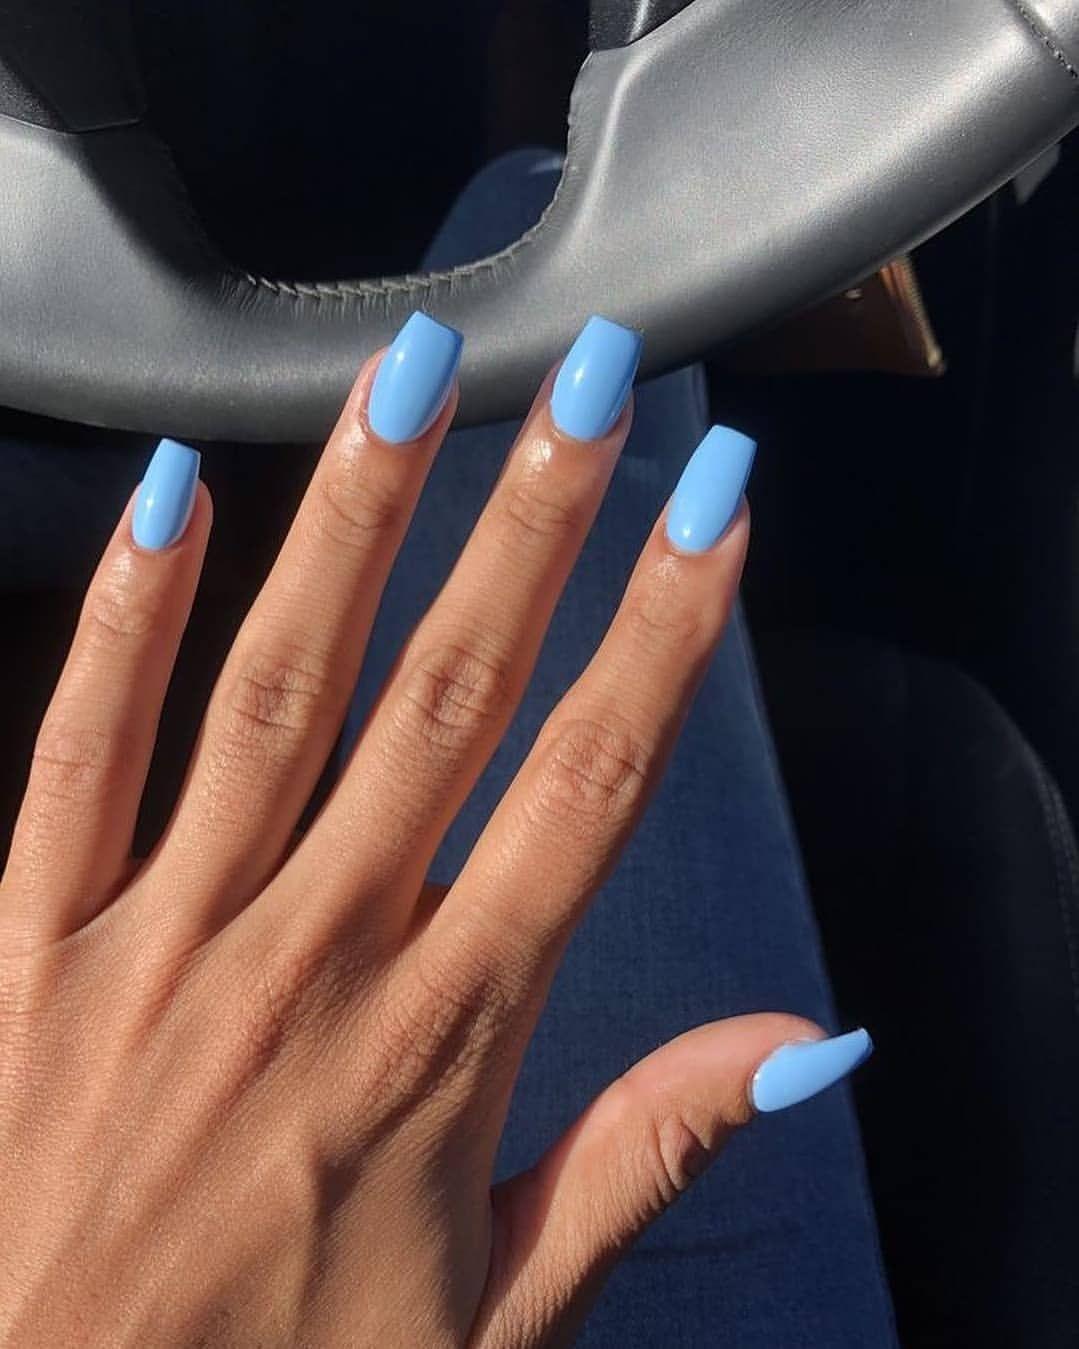 Long Nails Or Short Nails Islandclout Blue Acrylic Nails Short Acrylic Nails Cute Acrylic Nails